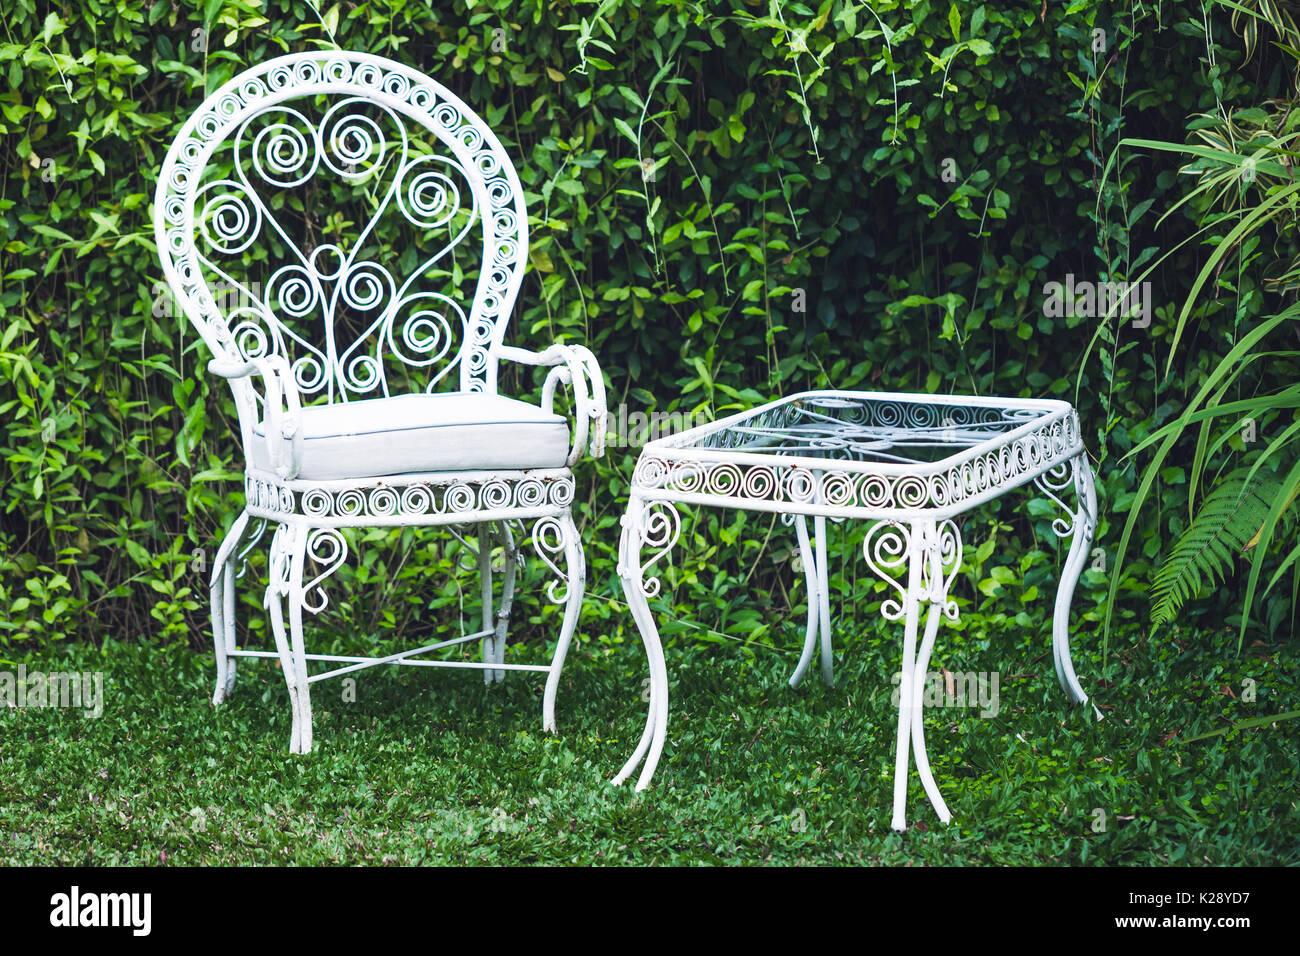 Vieux mobilier vintage en jardin naturel avec fond vert ...